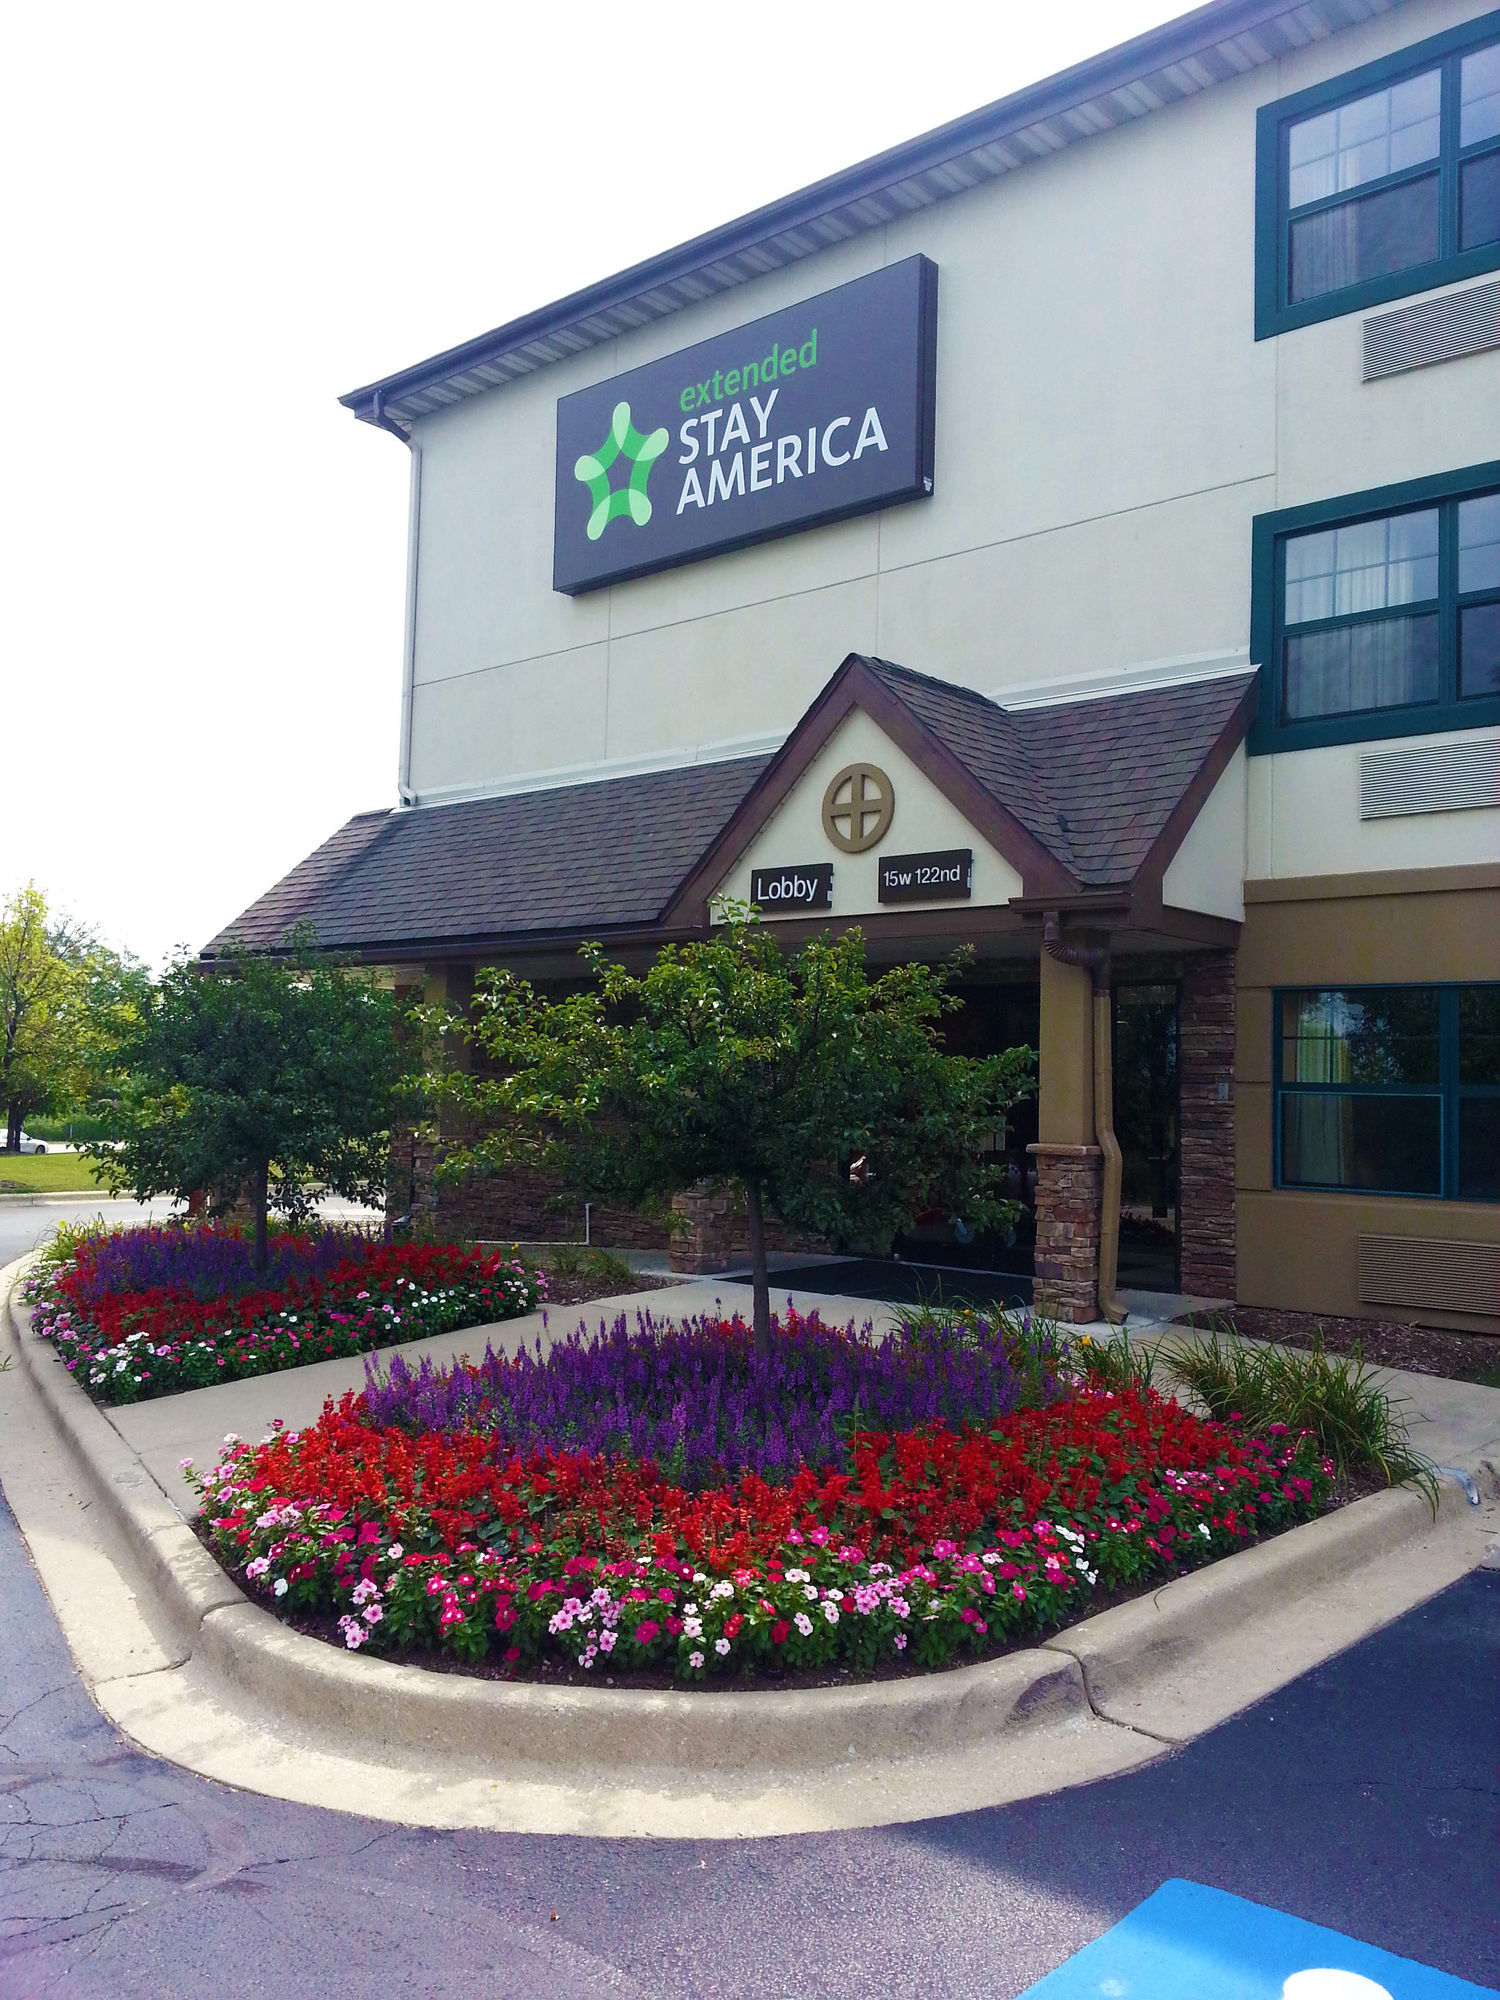 Extended Stay America Hotel Chicago Burr Ridge Burr Ridge Il